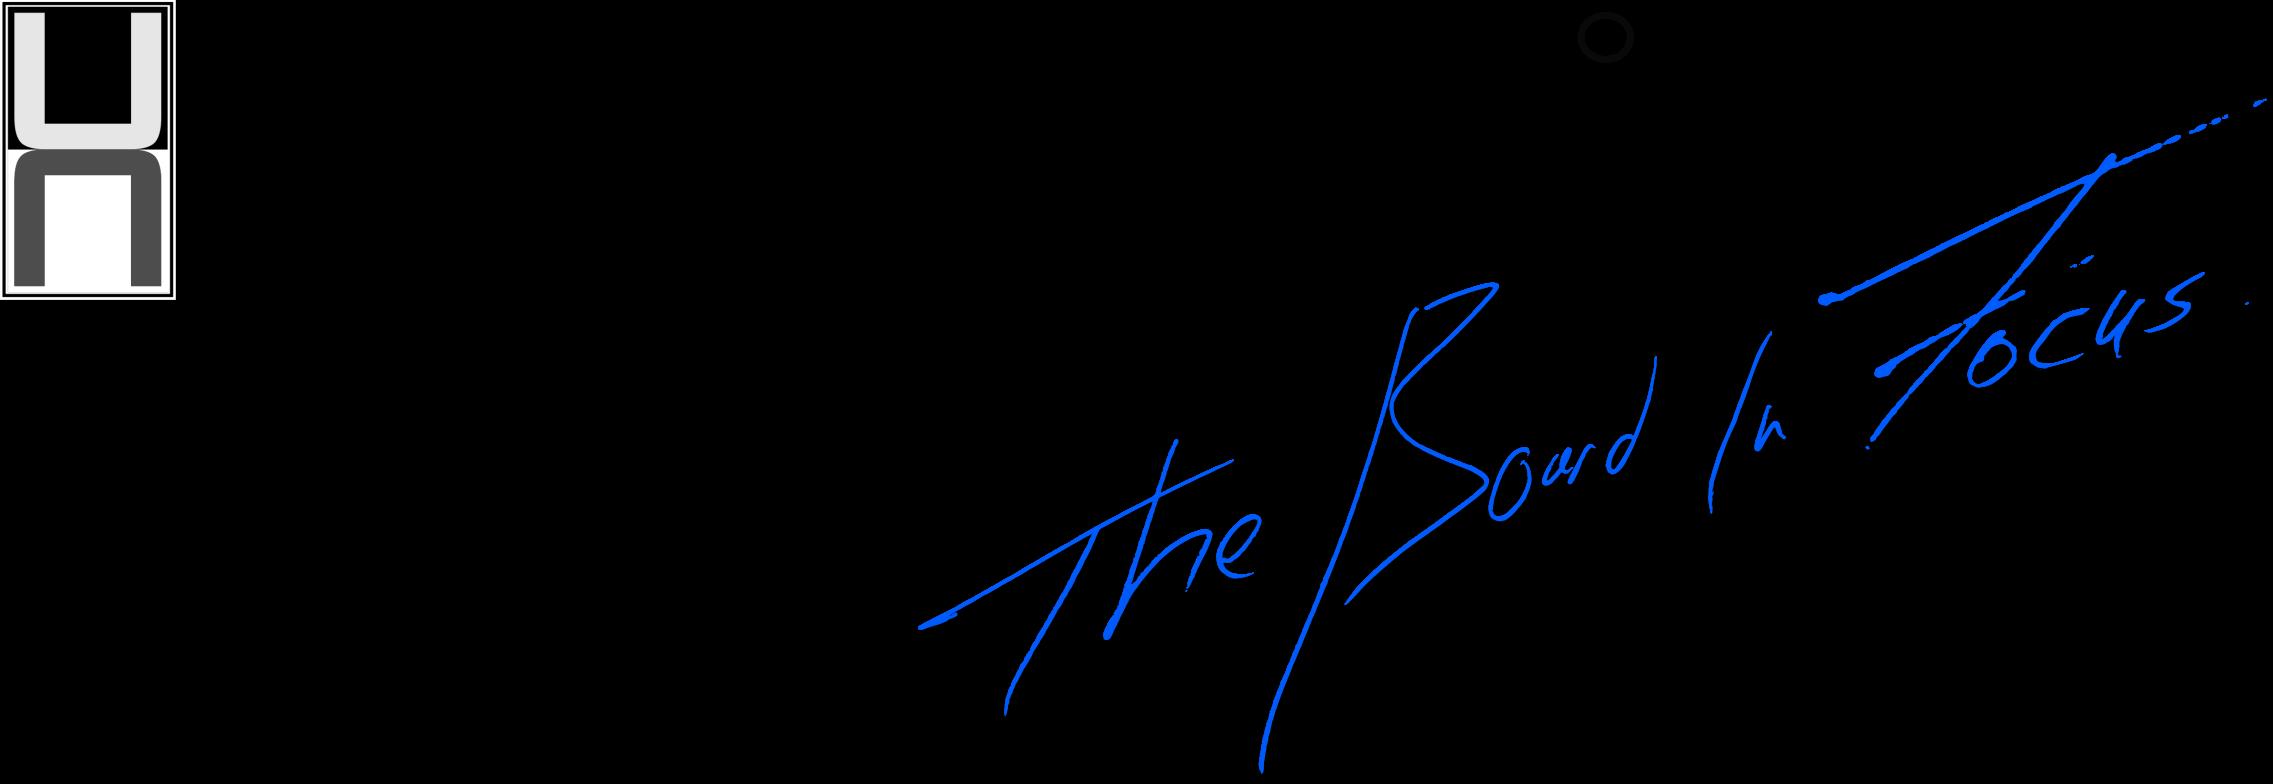 Hevige - Das Board im Fokus